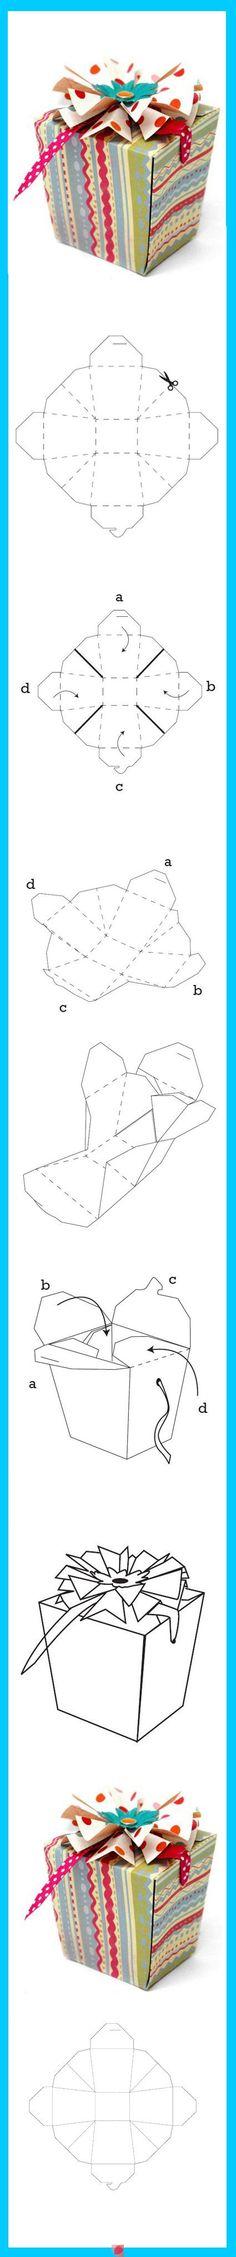 Box templates: